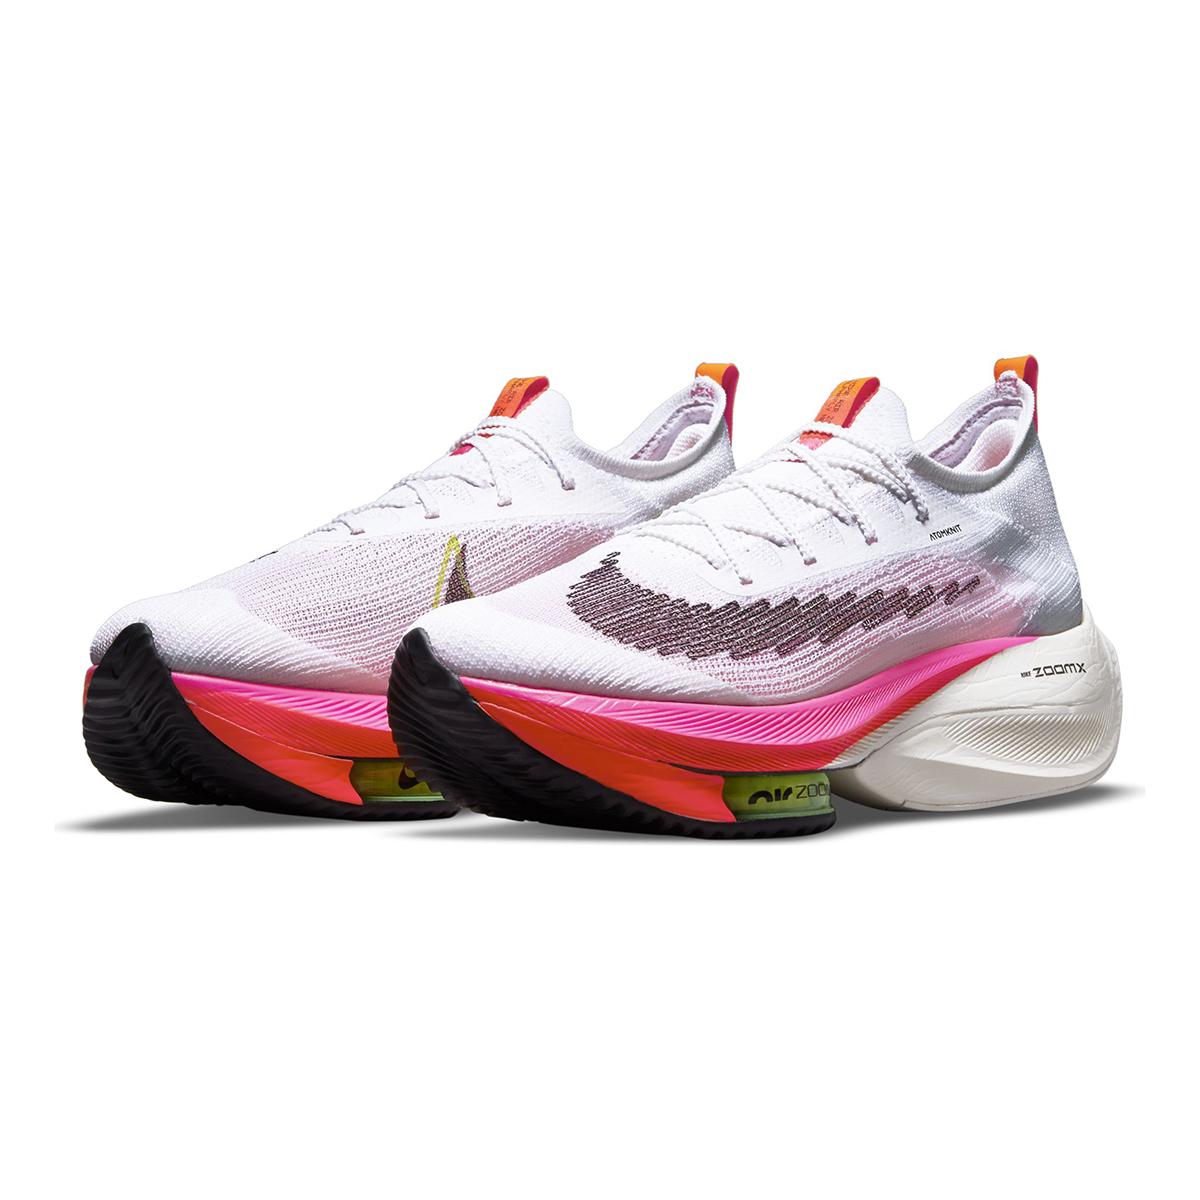 Men's Nike Air Zoom Alphafly Next% Flyknit Running Shoe - Color: Rawdacious - Size: 6 - Width: Regular, Rawdacious, large, image 4